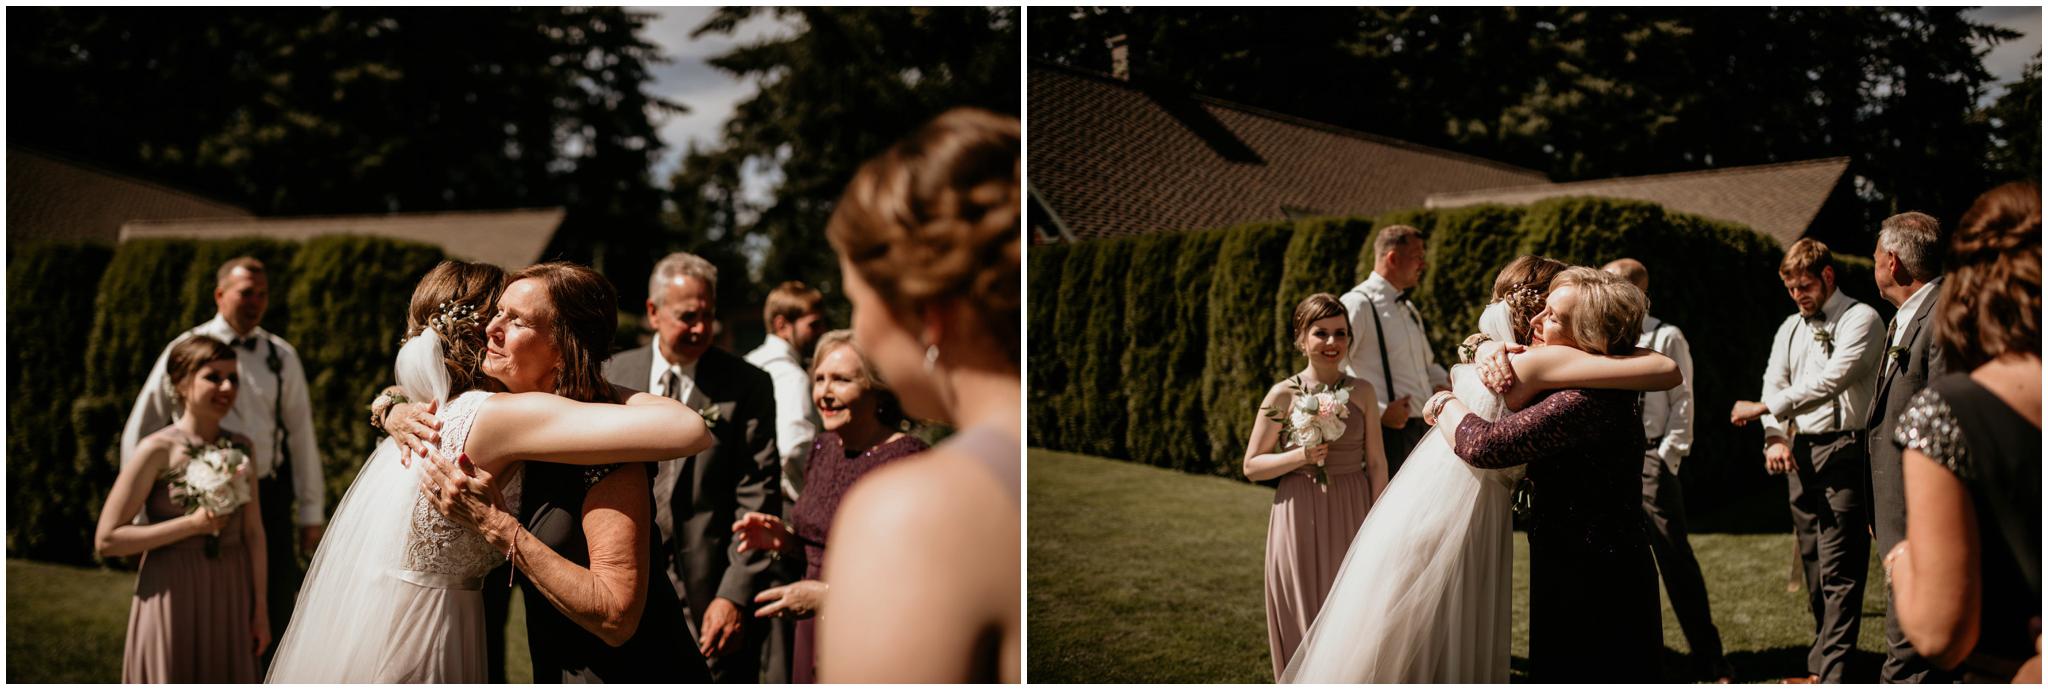 erin-and-tyler-evergreen-gardens-bellingham-wedding-photographer-066.jpg